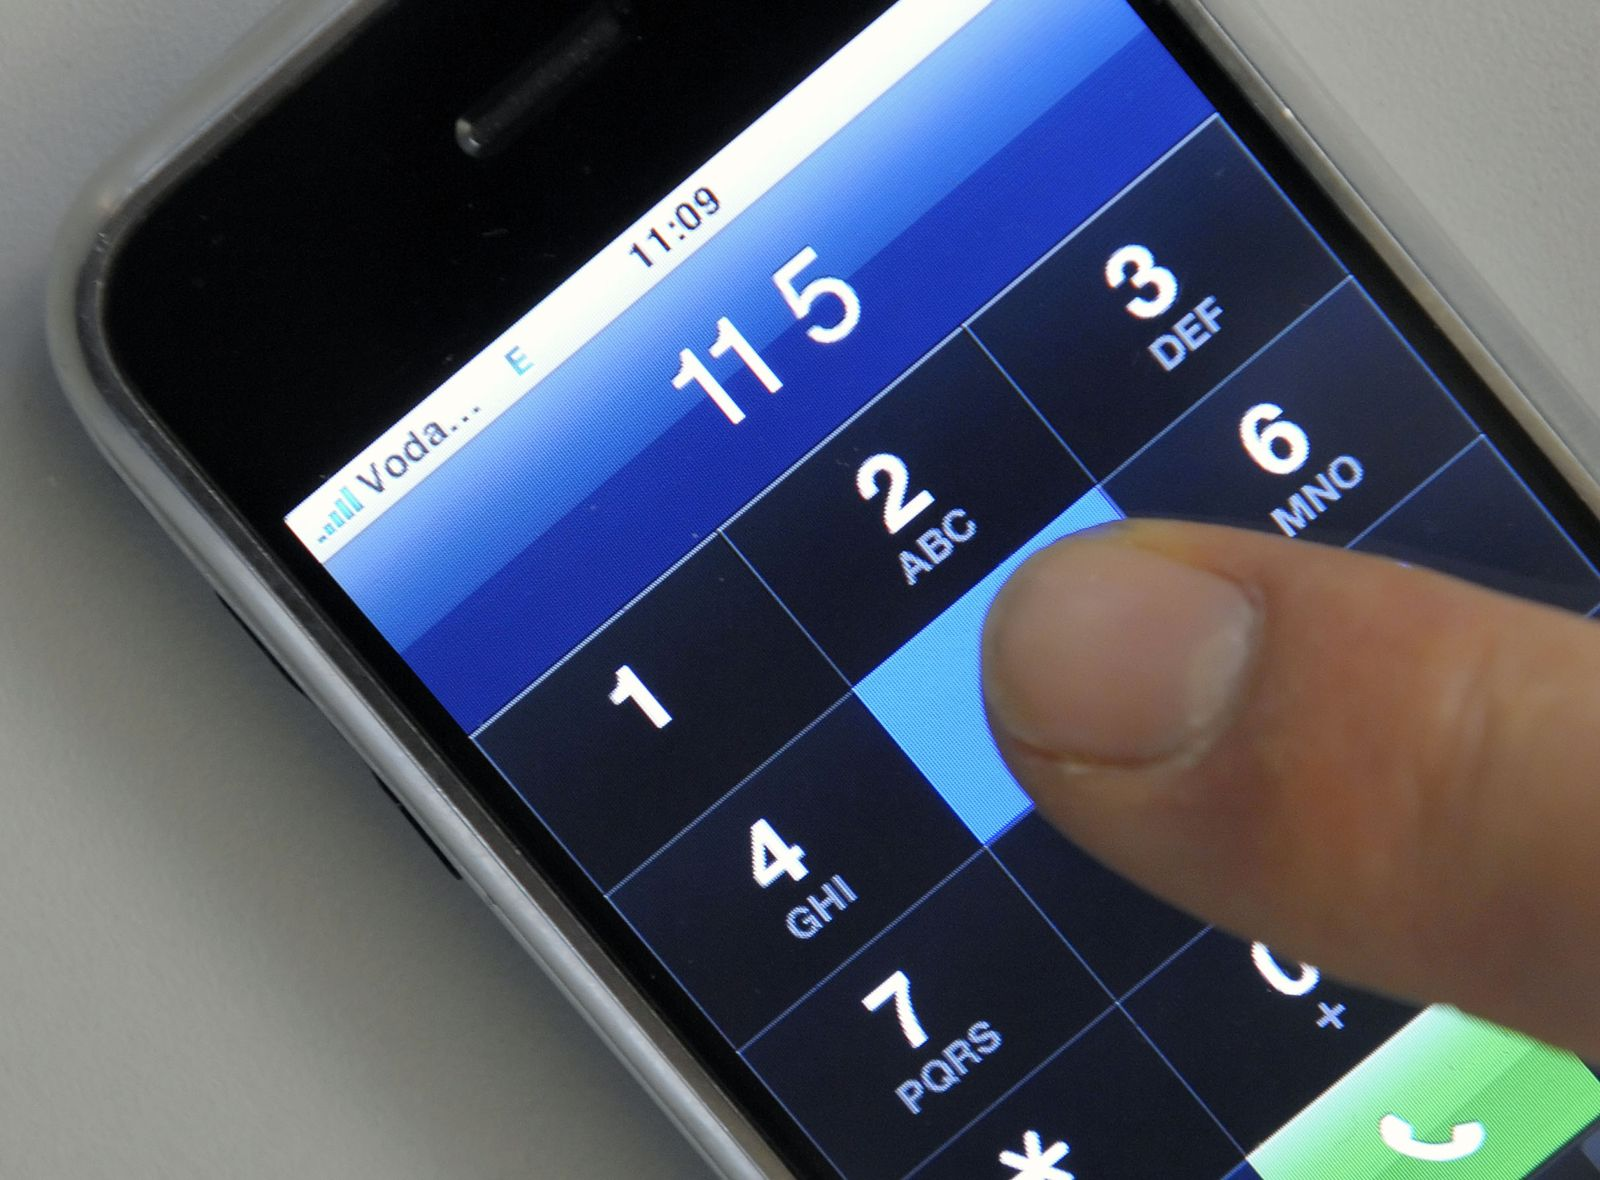 iPhone/ Telefon/ Telefonnummer/ Wählen